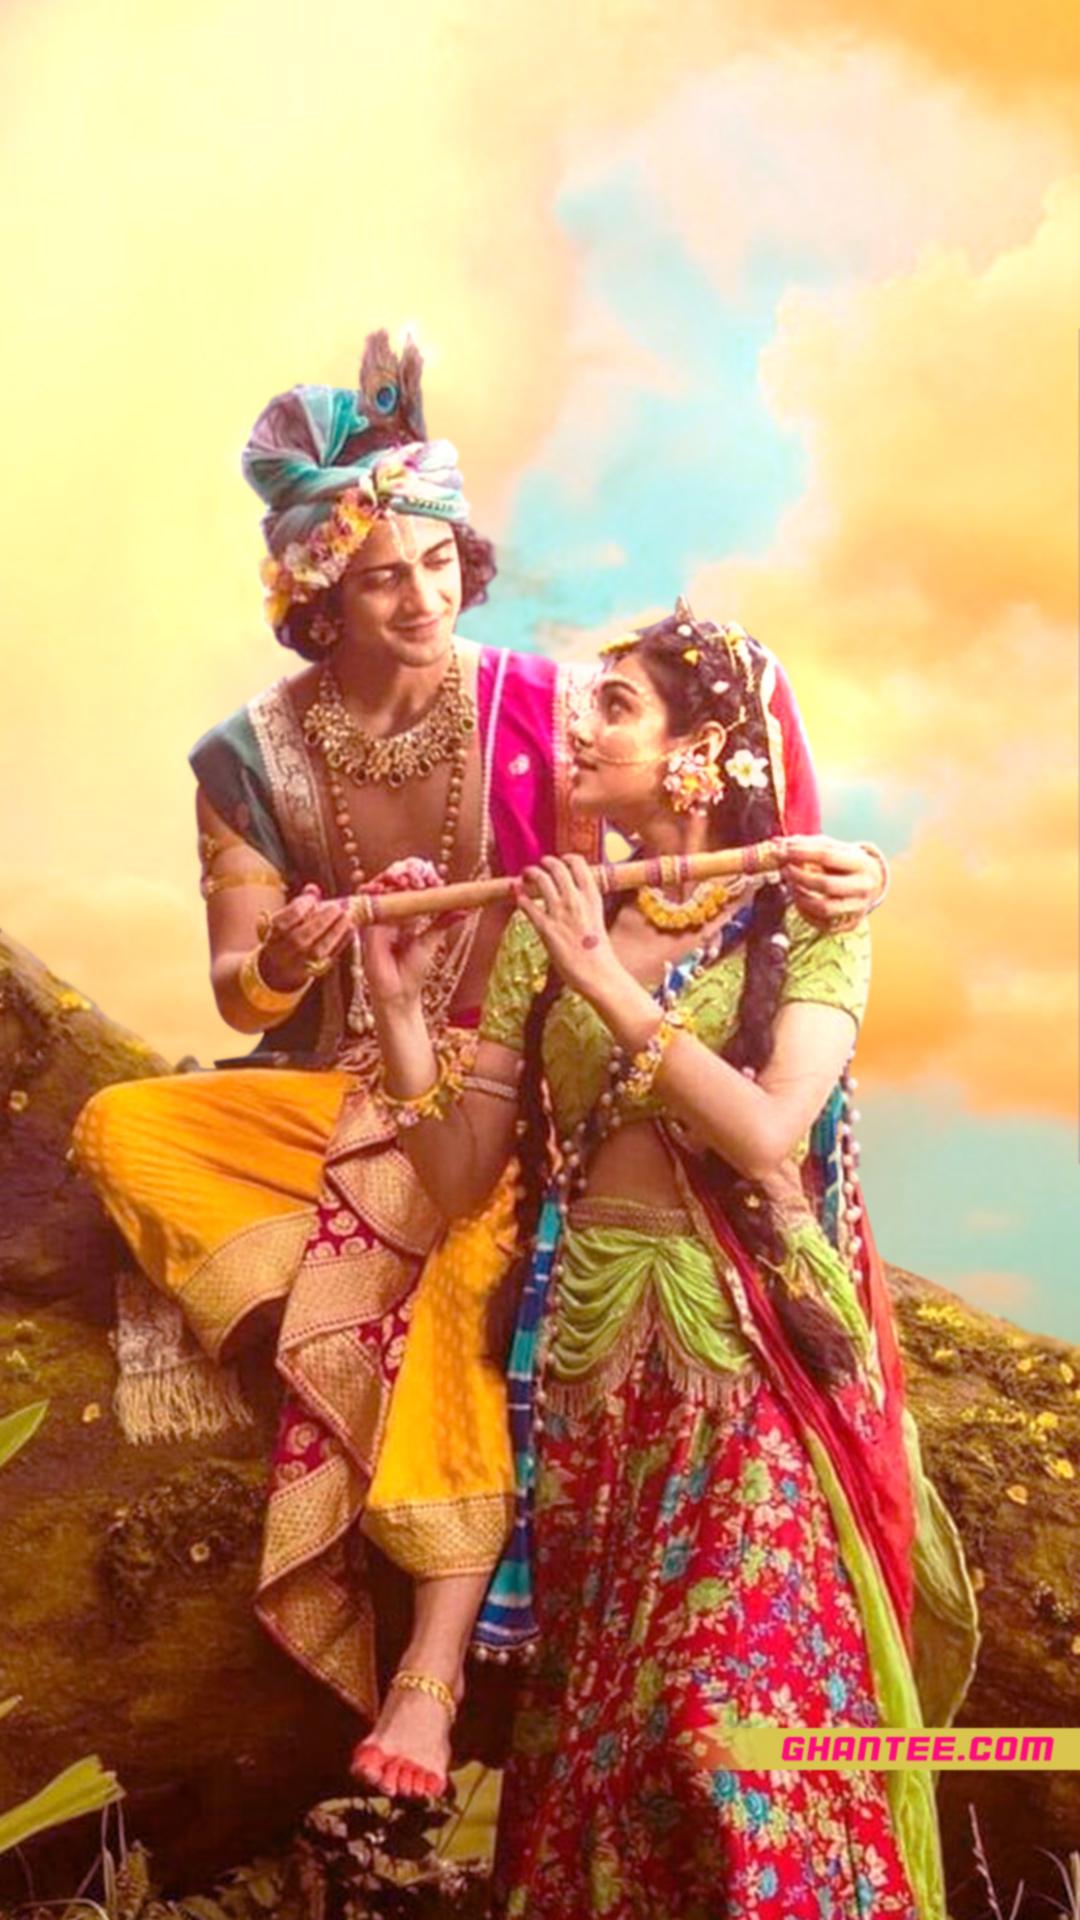 radhakrishna colorful phone wallpaper